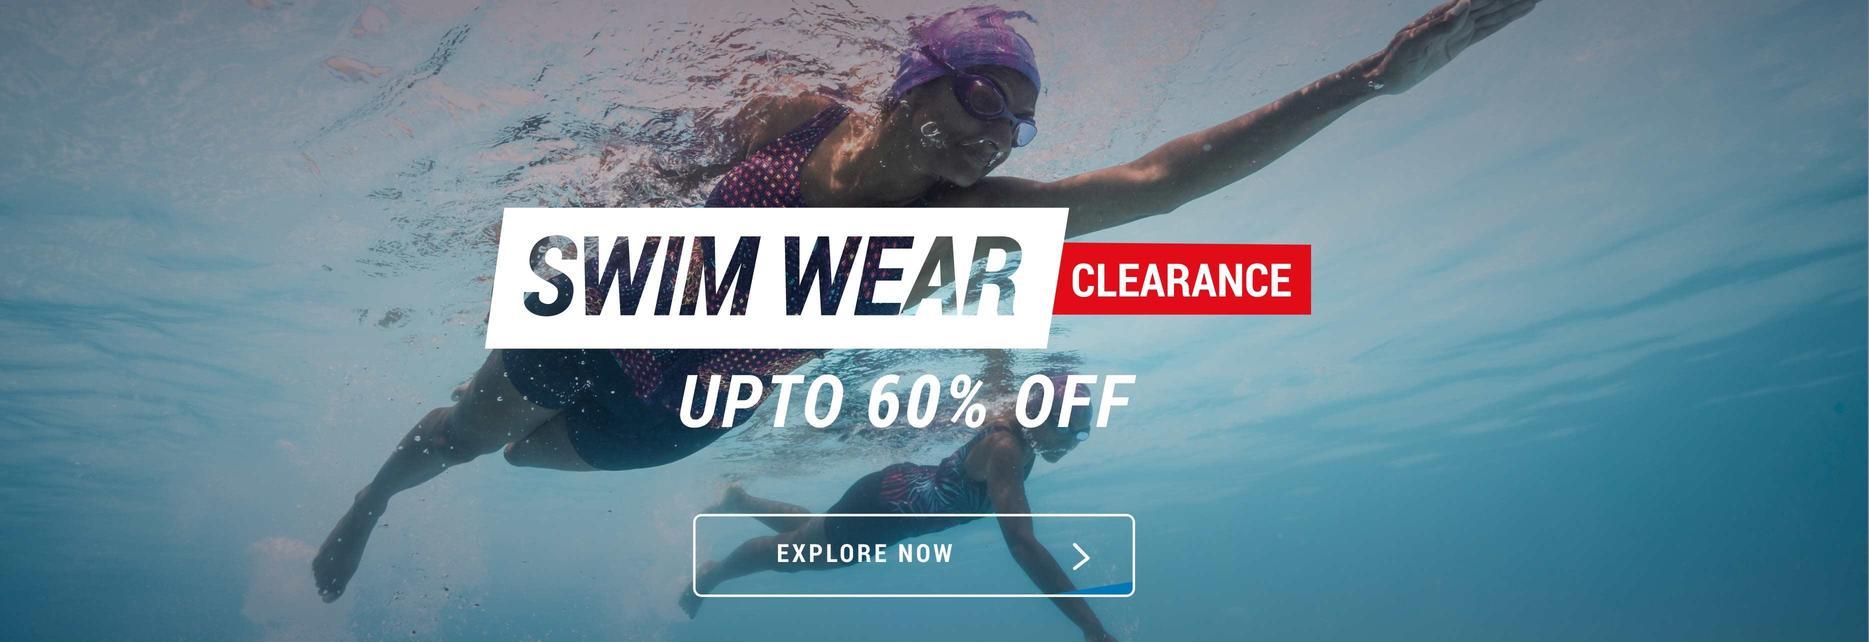 Decathlon Swim Wear Clearance